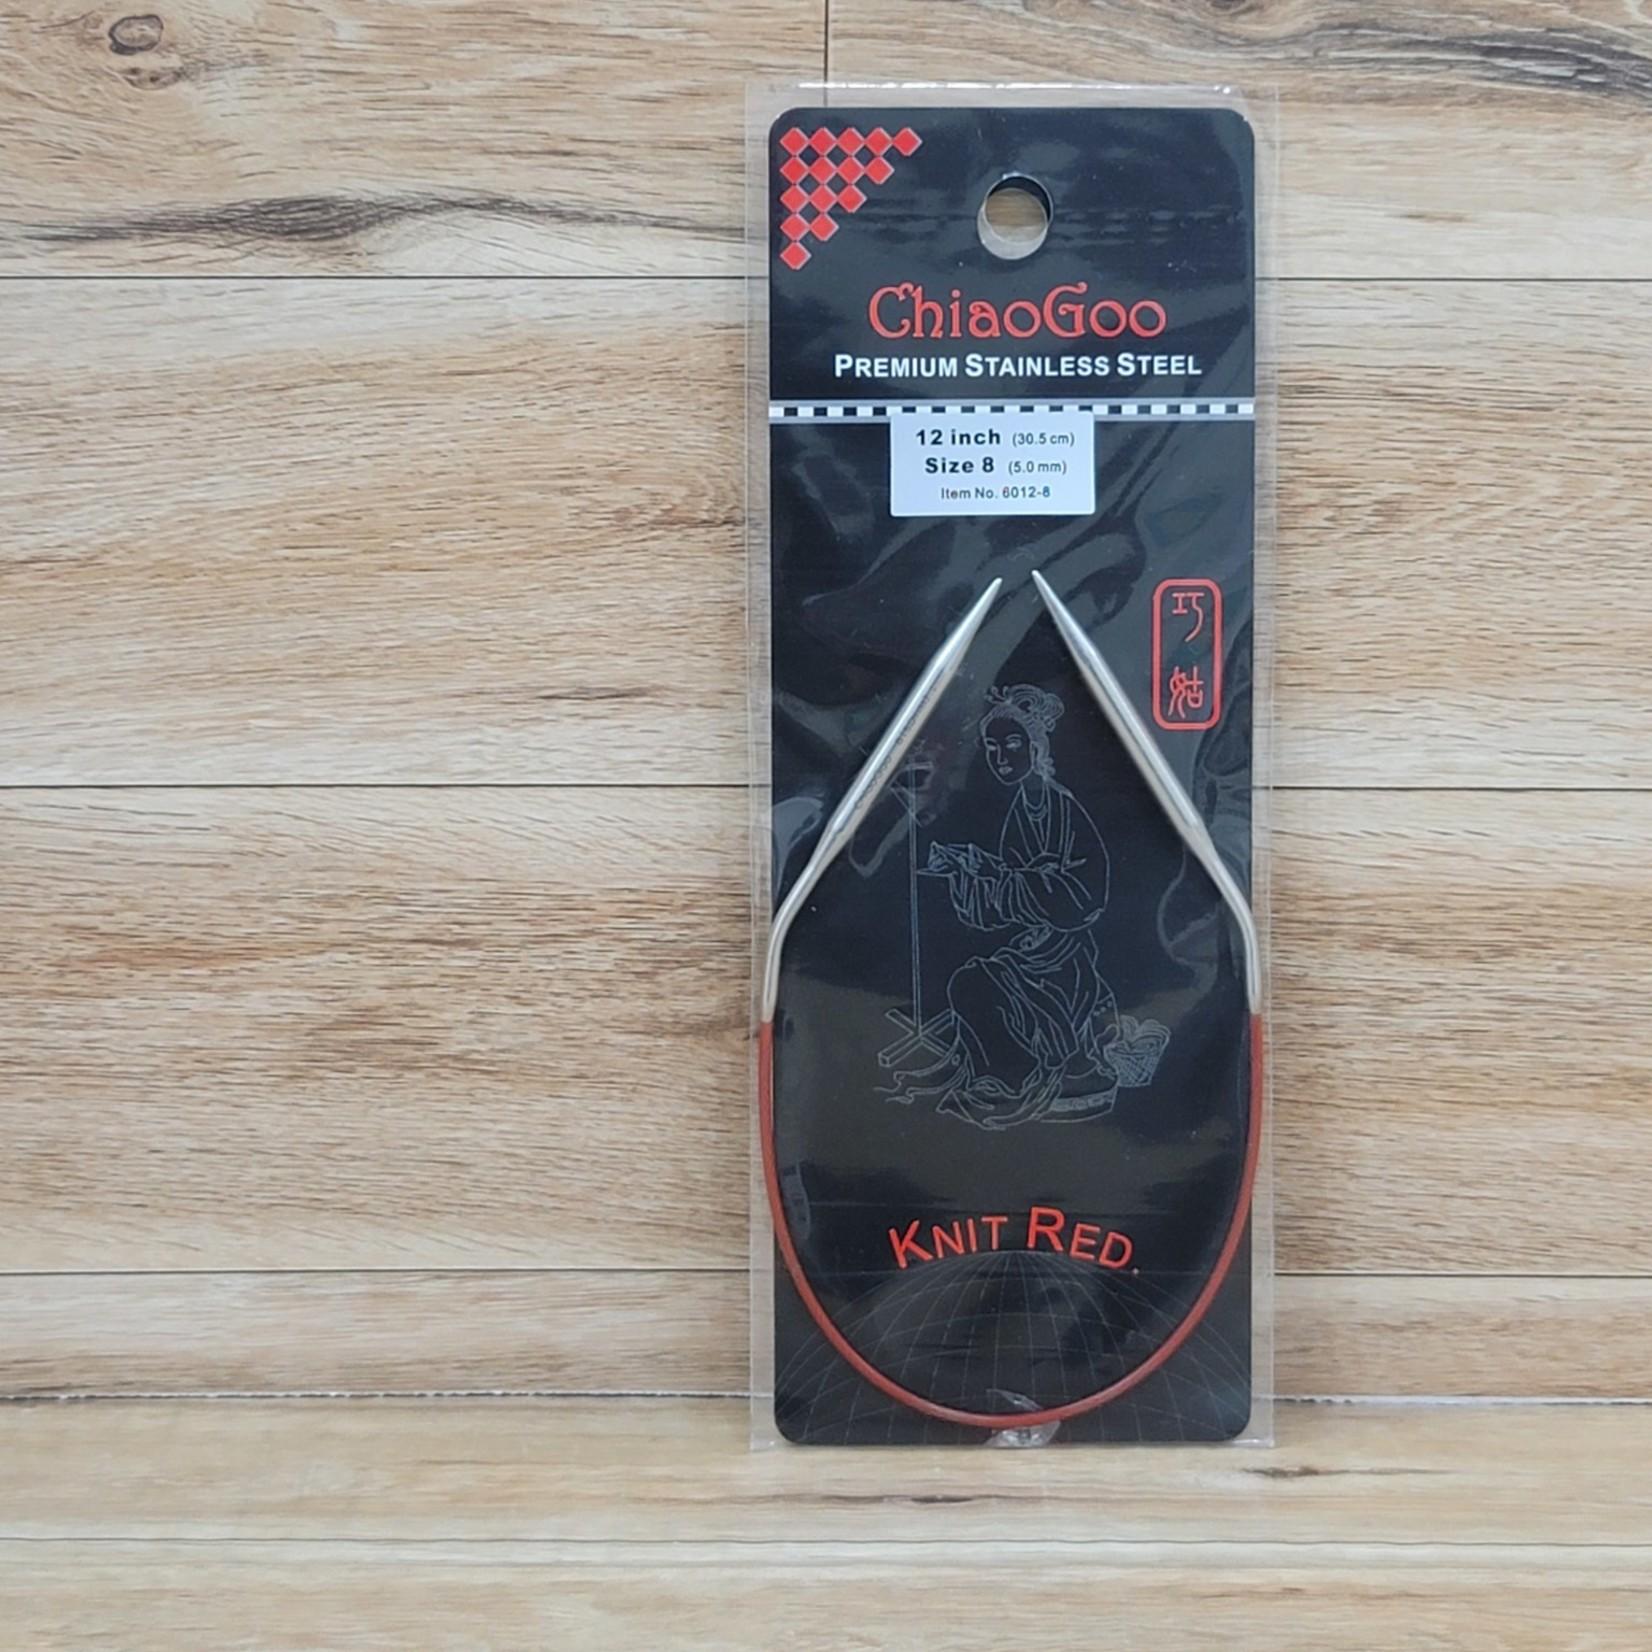 ChiaoGoo - Red Circular Knitting Needles - 12 inch Size 8 (5.0mm)